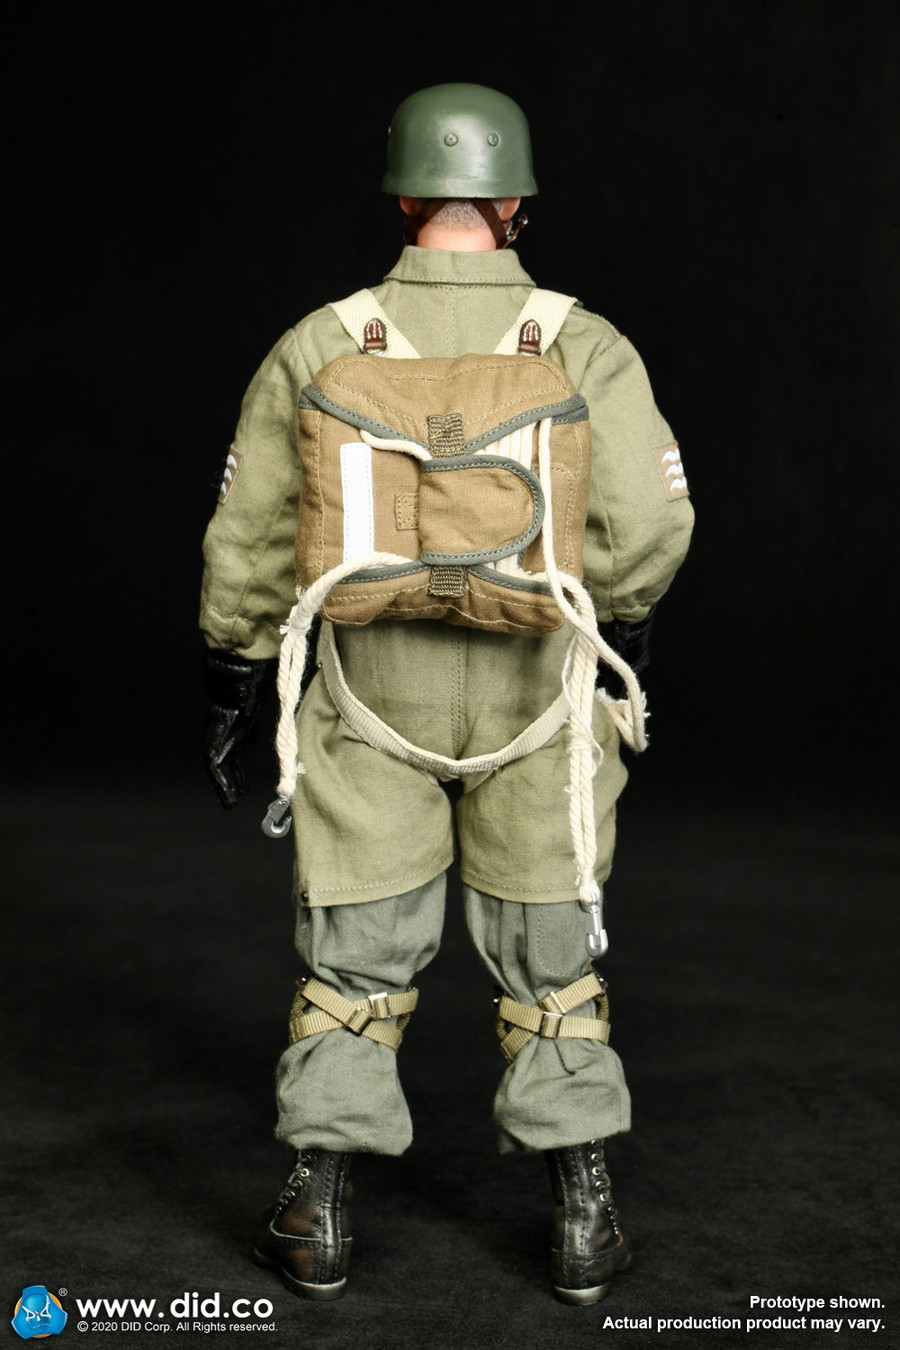 DID - WWII German Fallschirmjäger - Schmeling